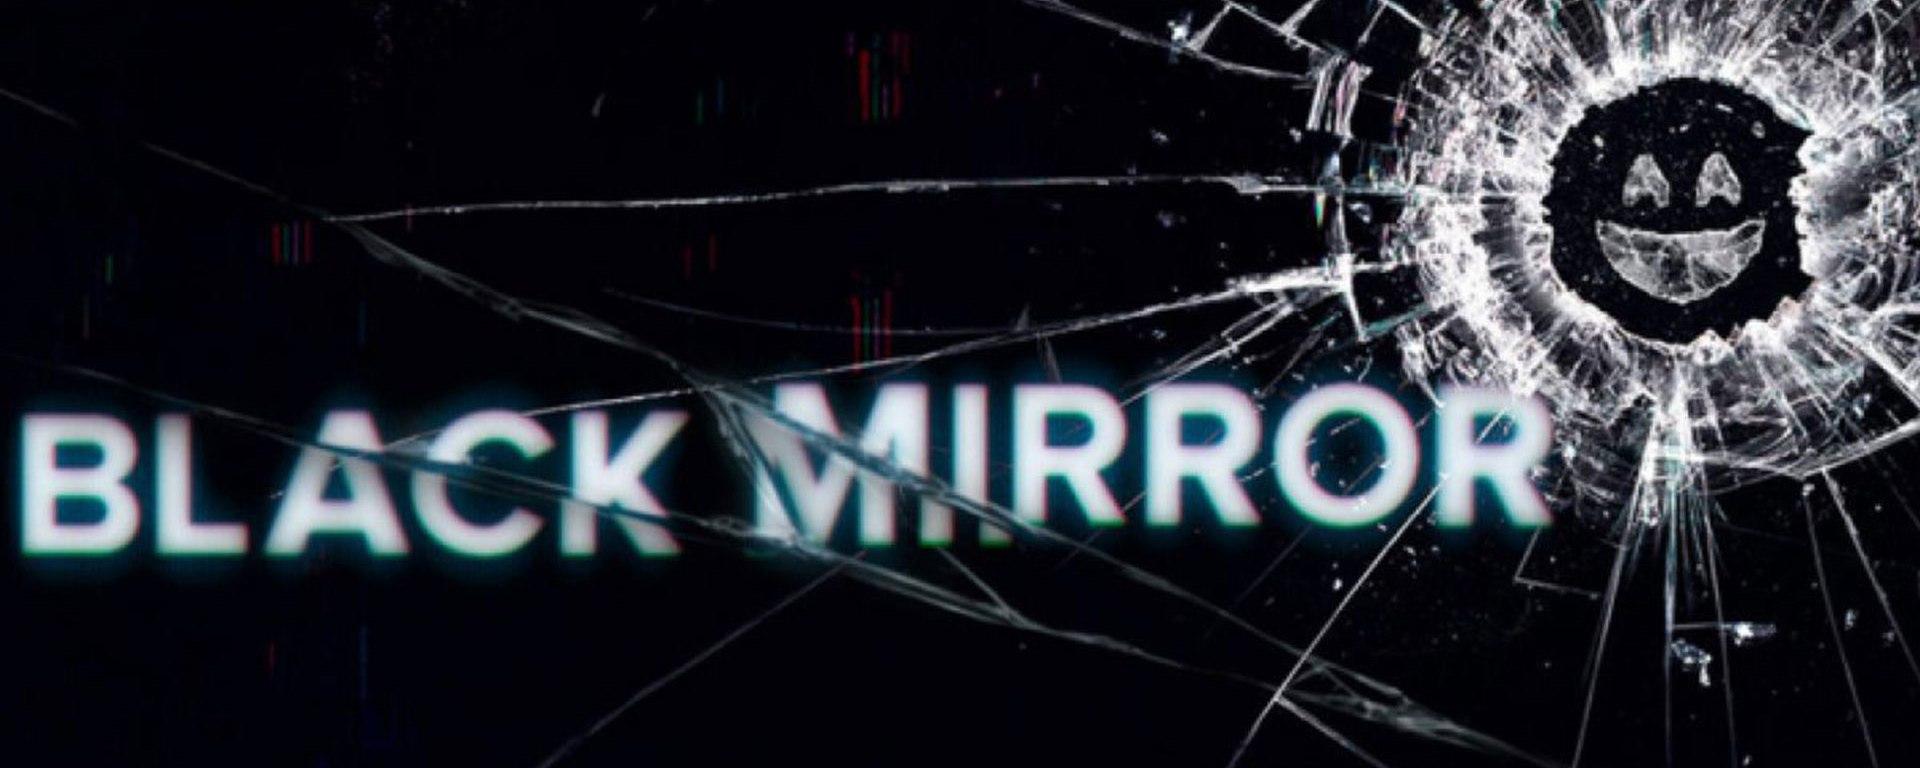 Black-Mirror-Cinema-Gizmo